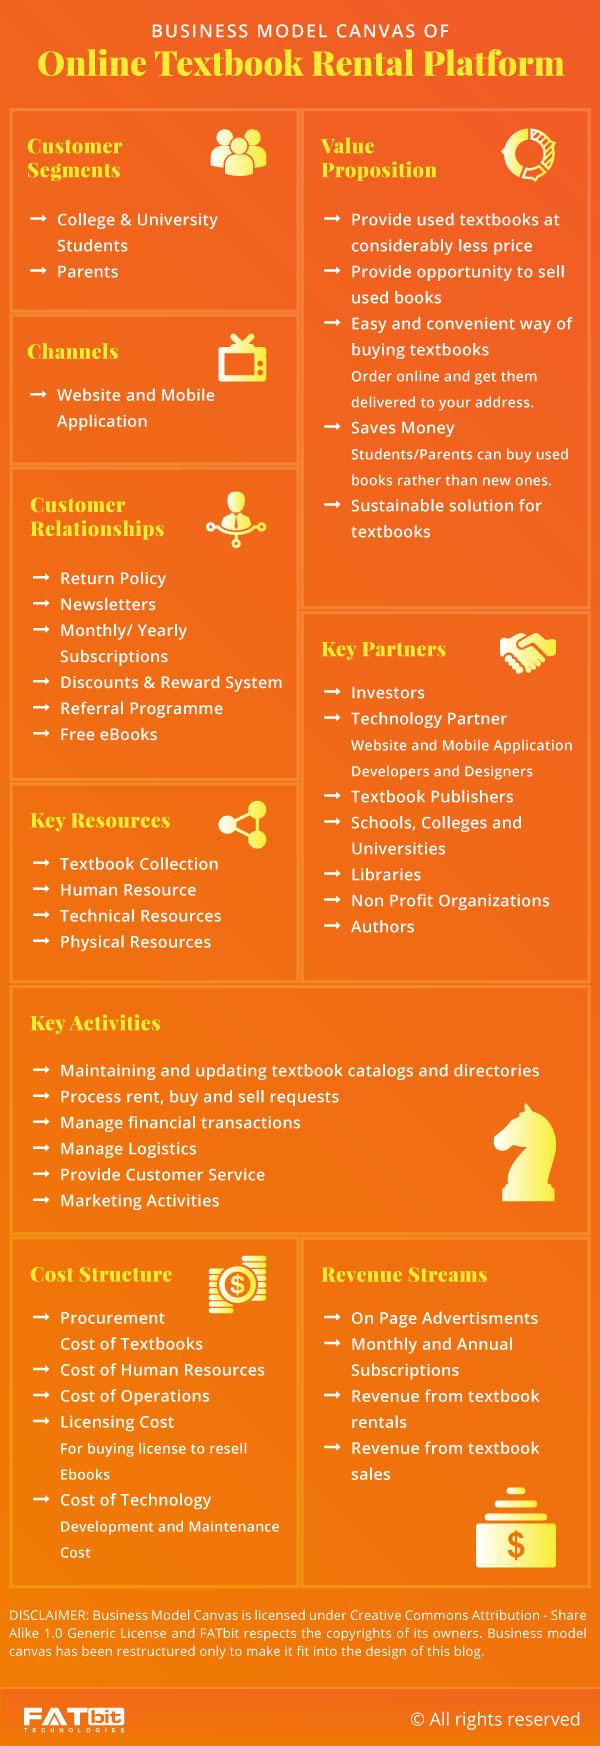 Business Model Canvas- Online Textbook Rental Platform